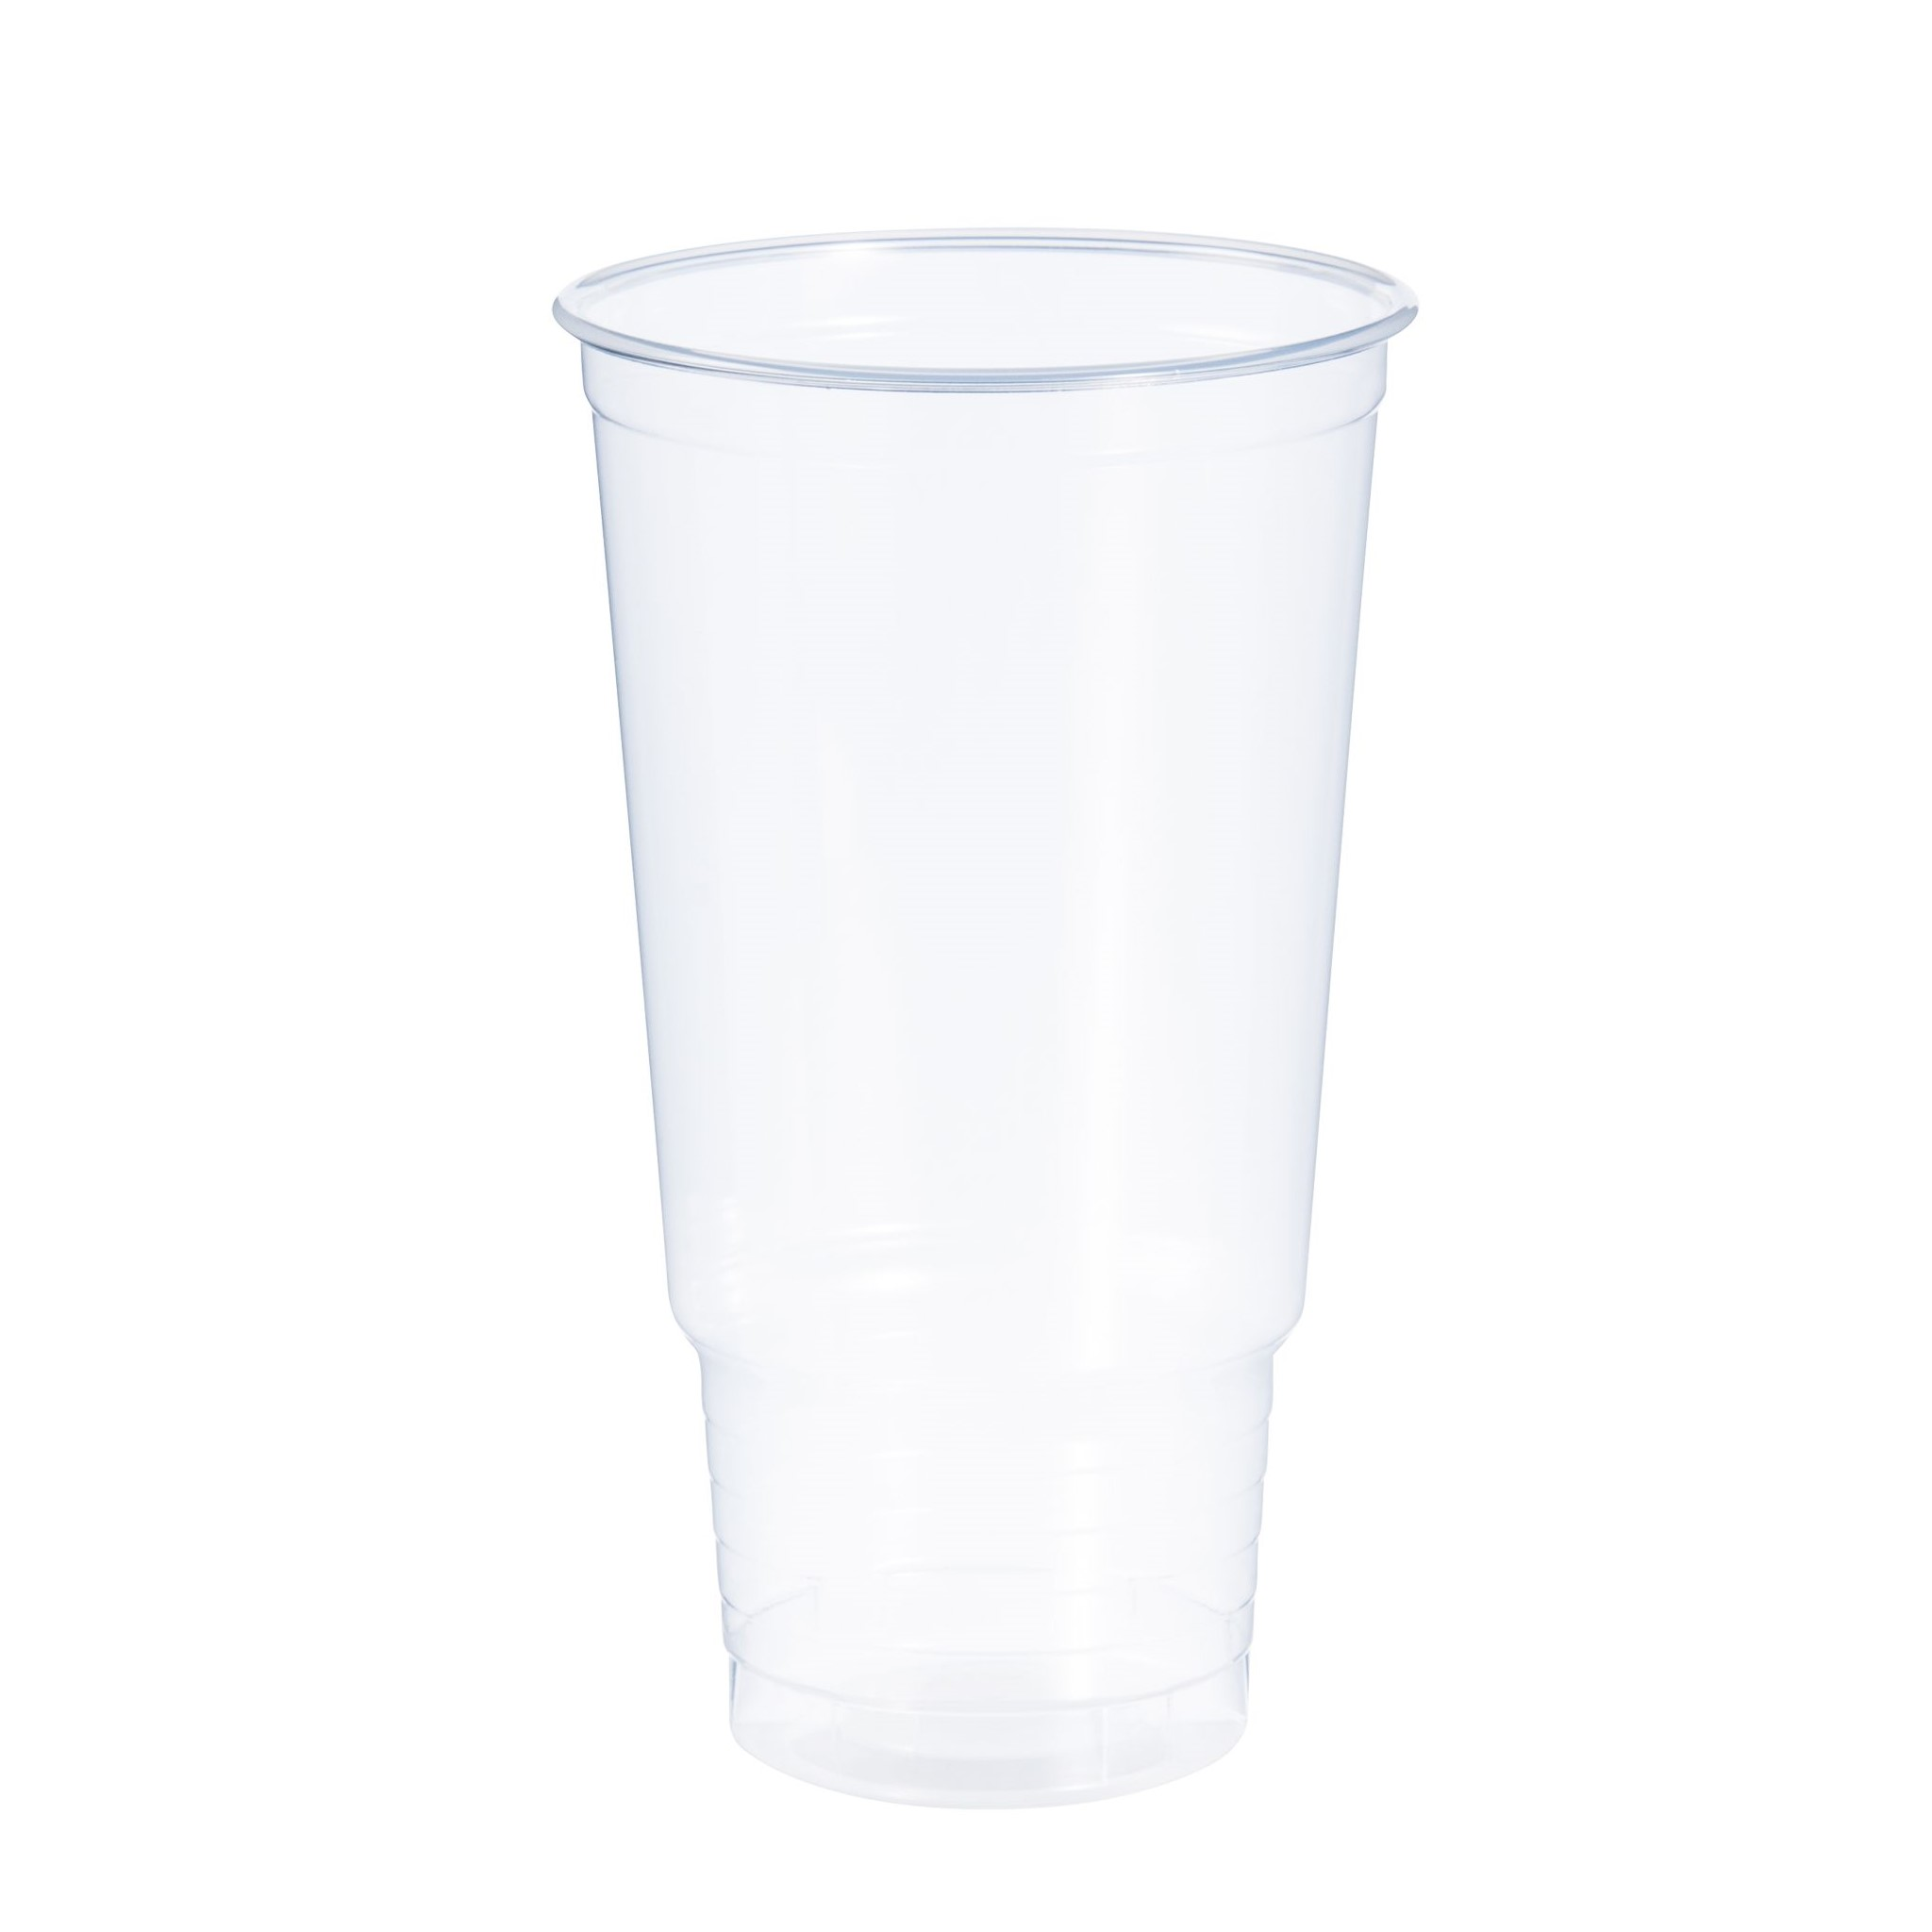 Dart 32P Conex ClearPro® Clear Pedestal PP 32oz Cup 500ct